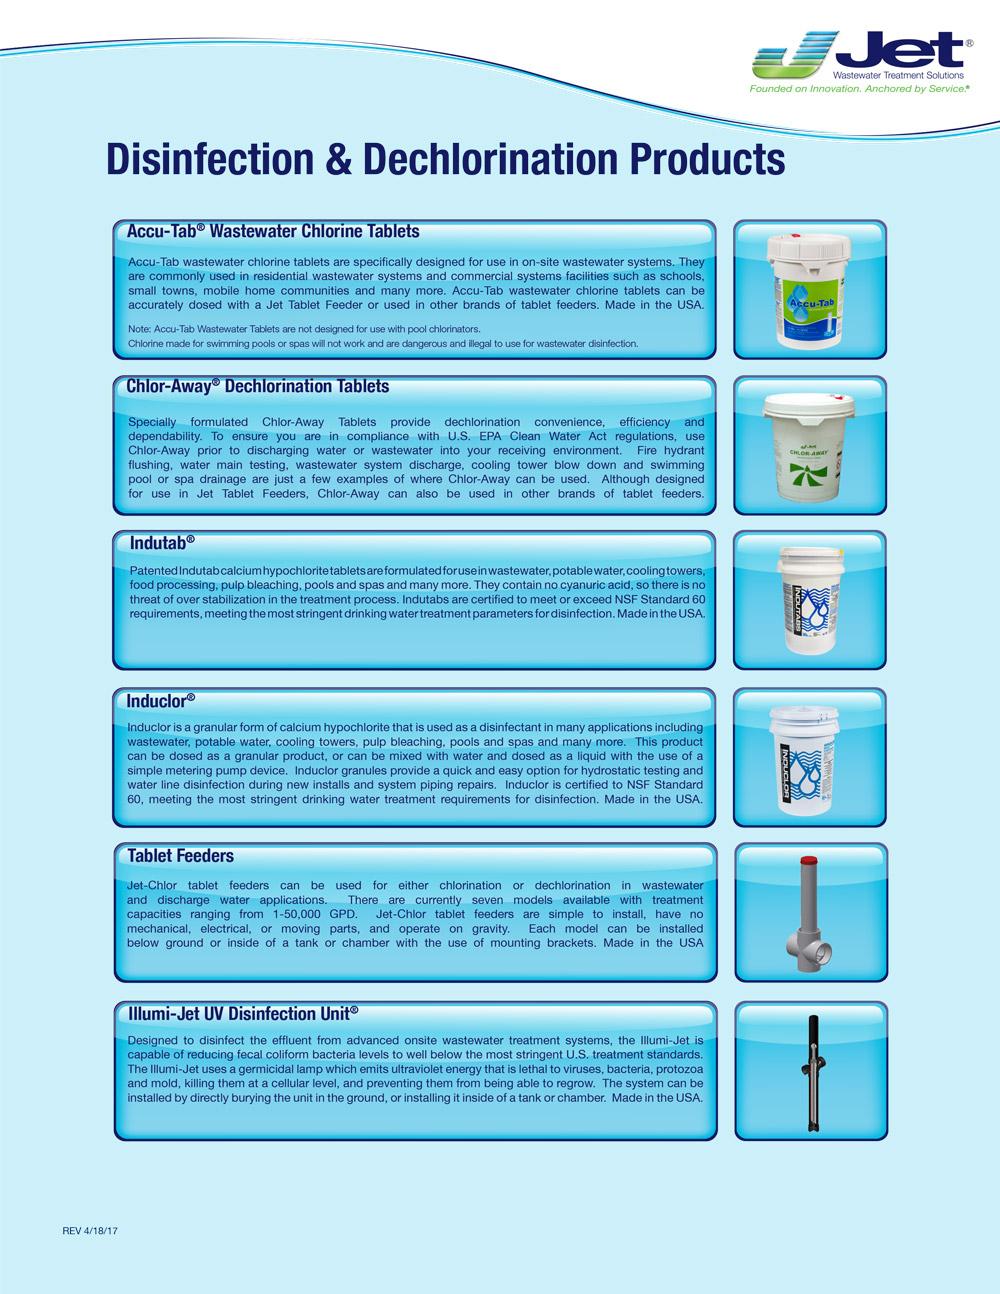 Jet Disinfection & Dechlorination Products document image